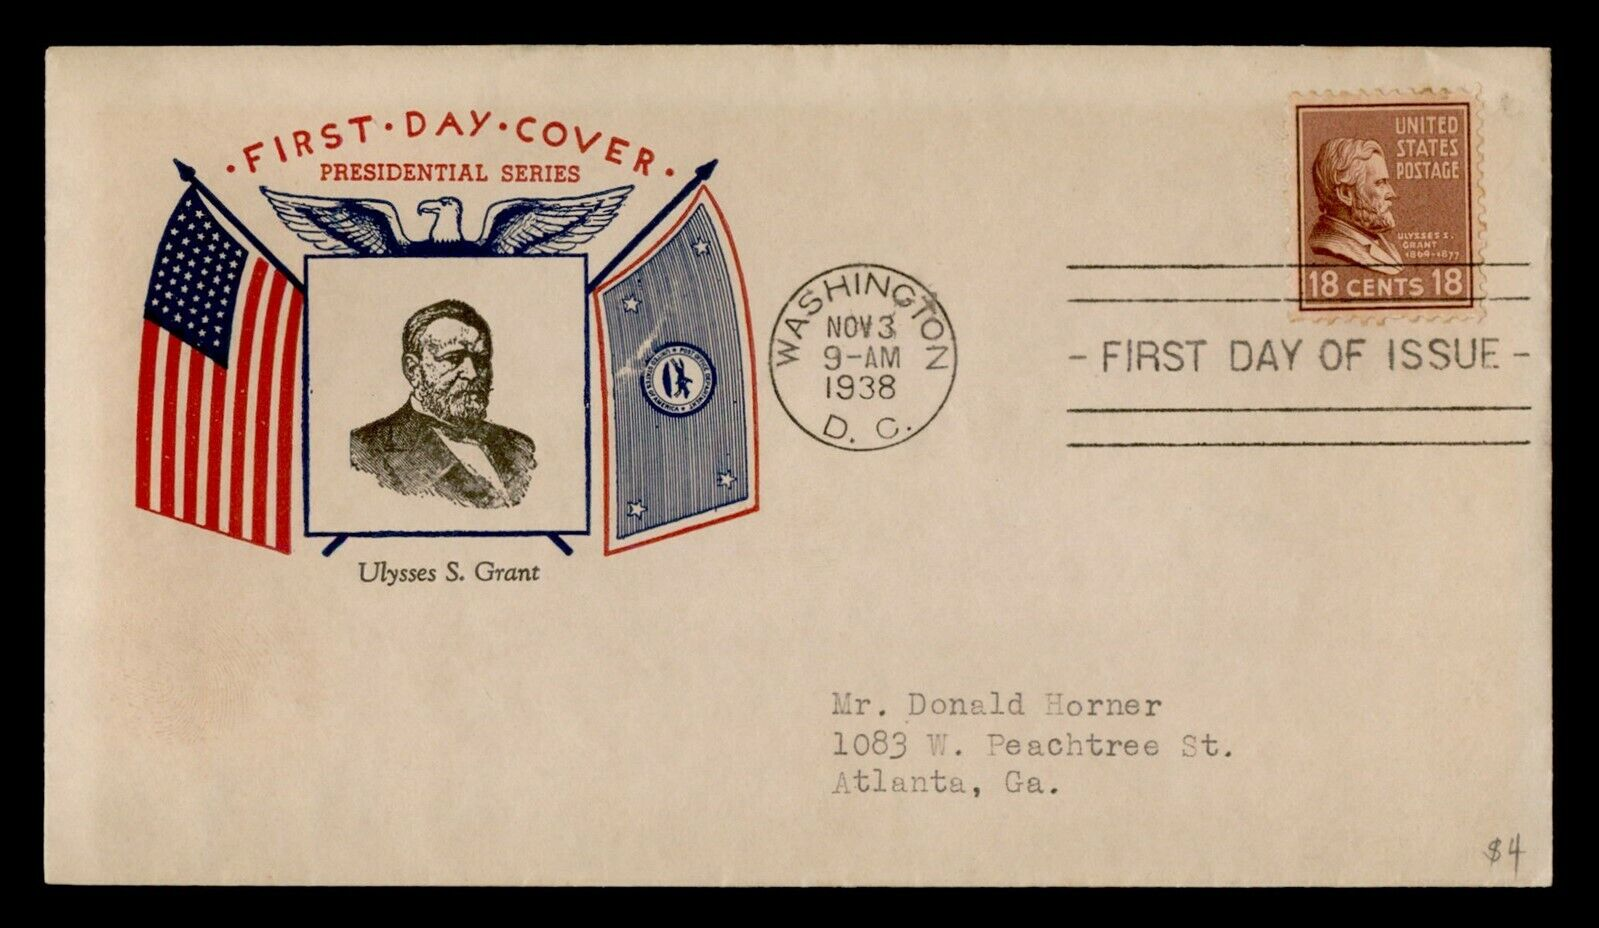 DR WHO 1938 ULYSSES S. GRANT PREXIE FDC C211910 - $0.50